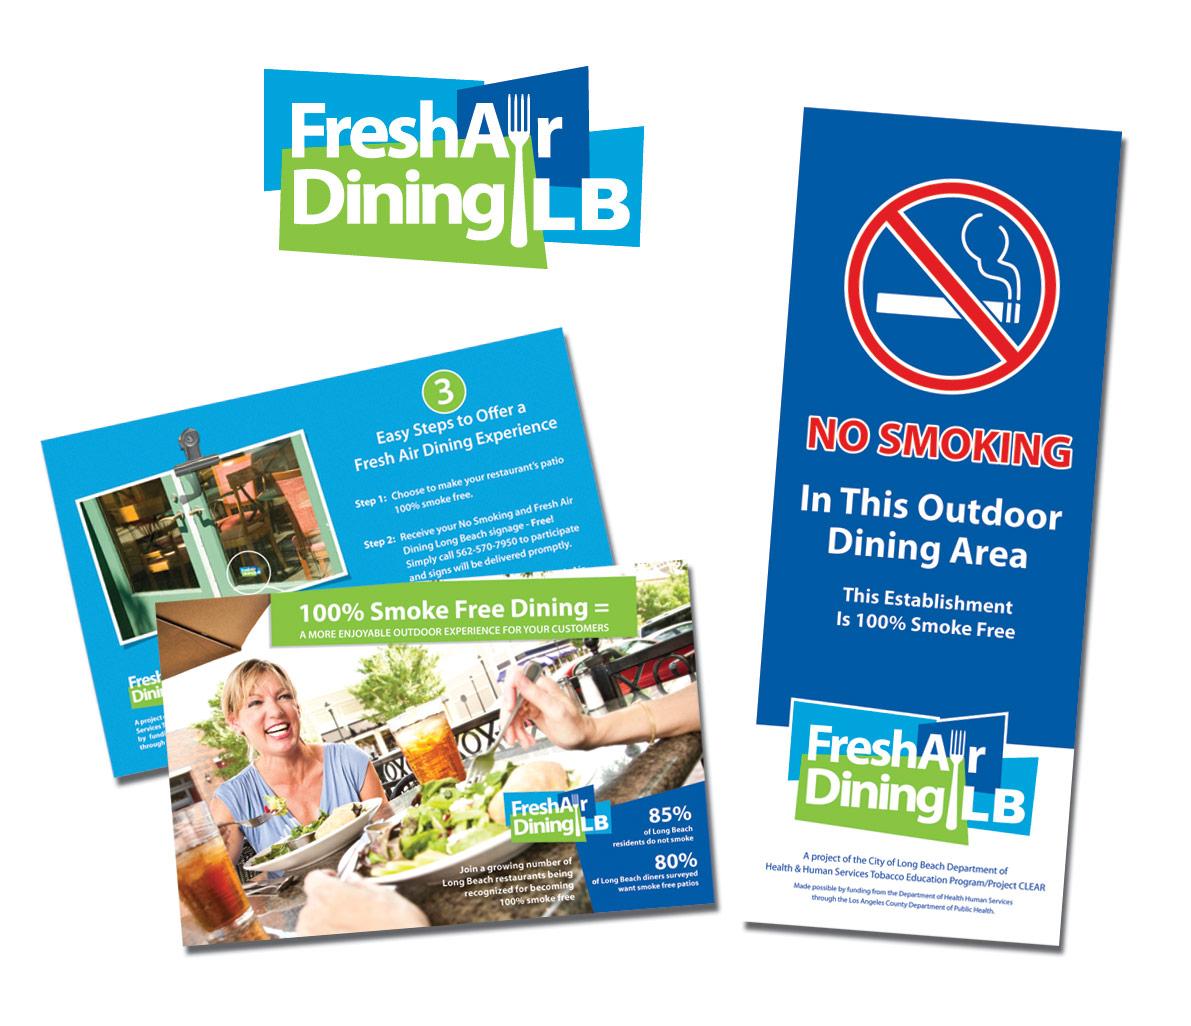 City of Long Beach Fresh Air Dining Marketing Campaign